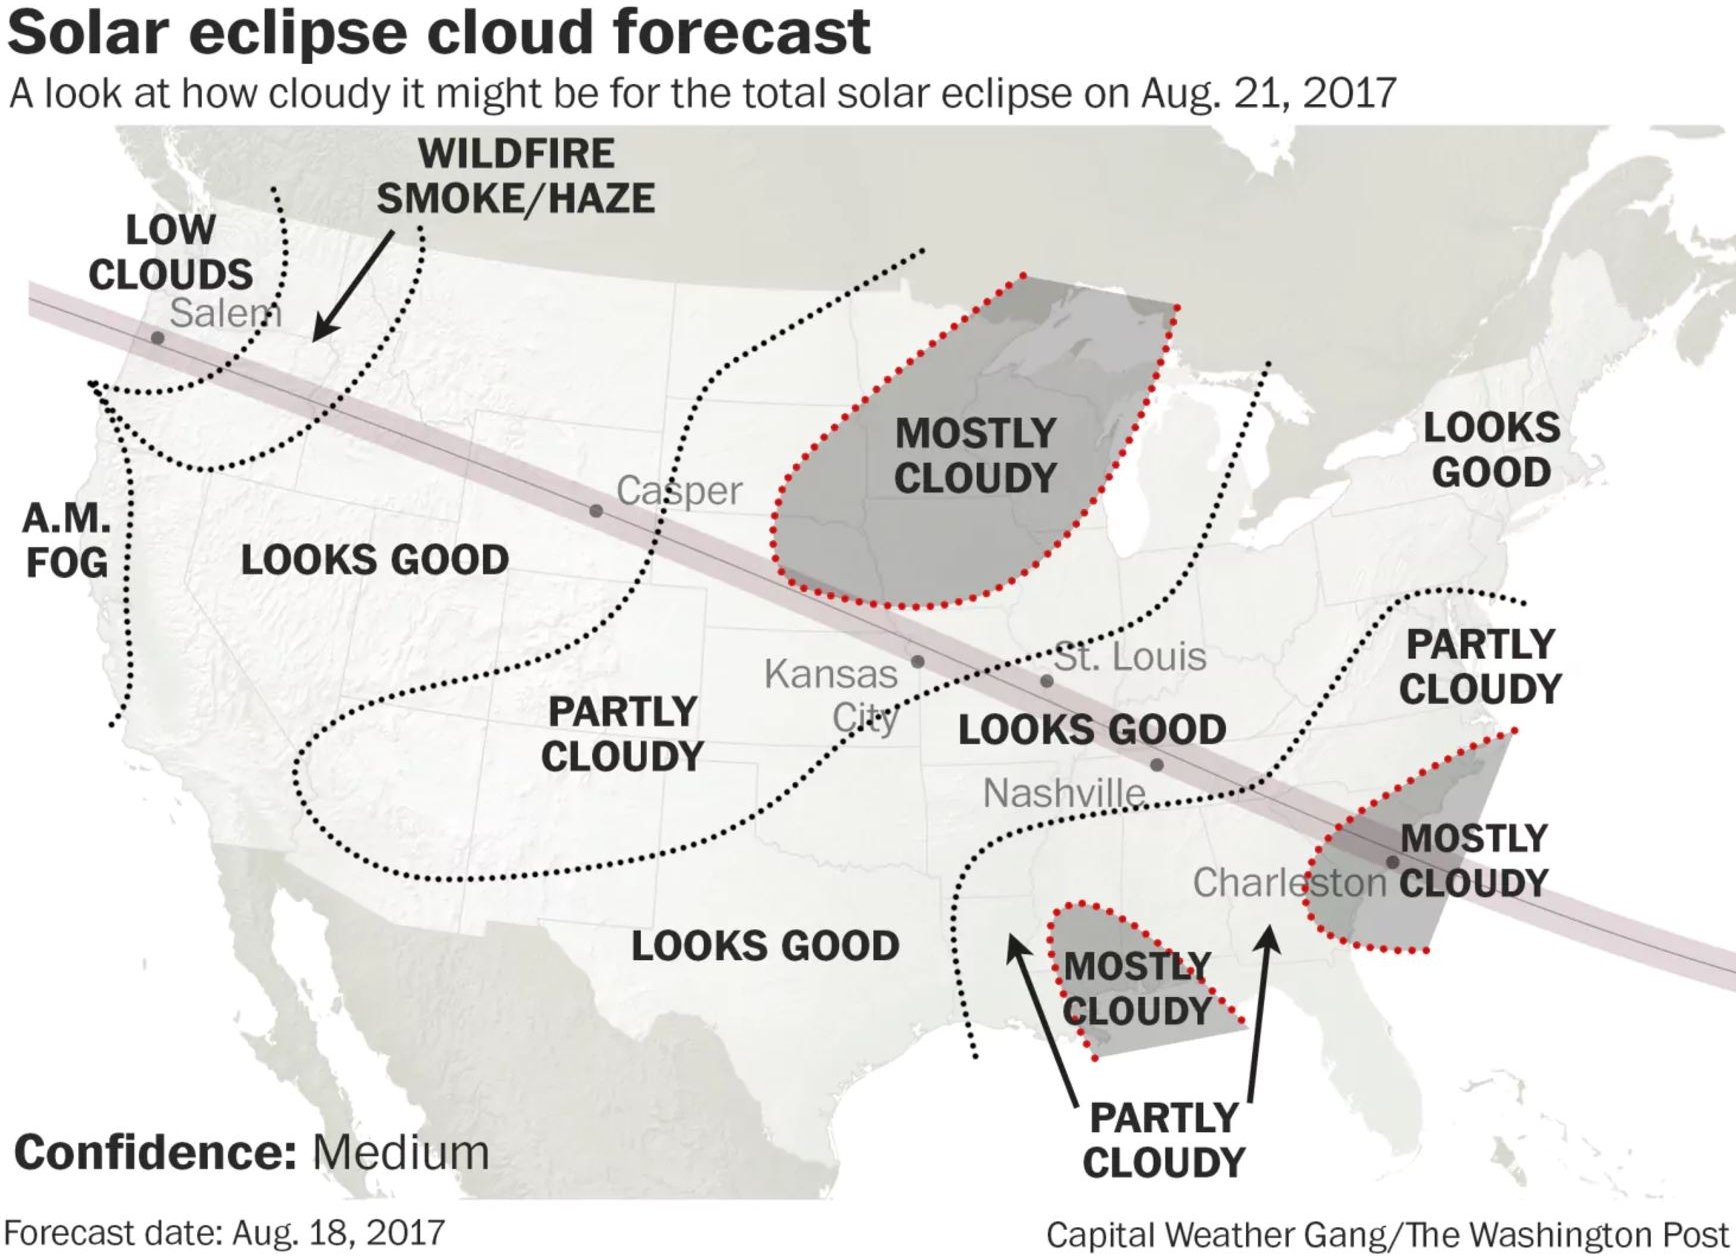 Image from  The Washington Post